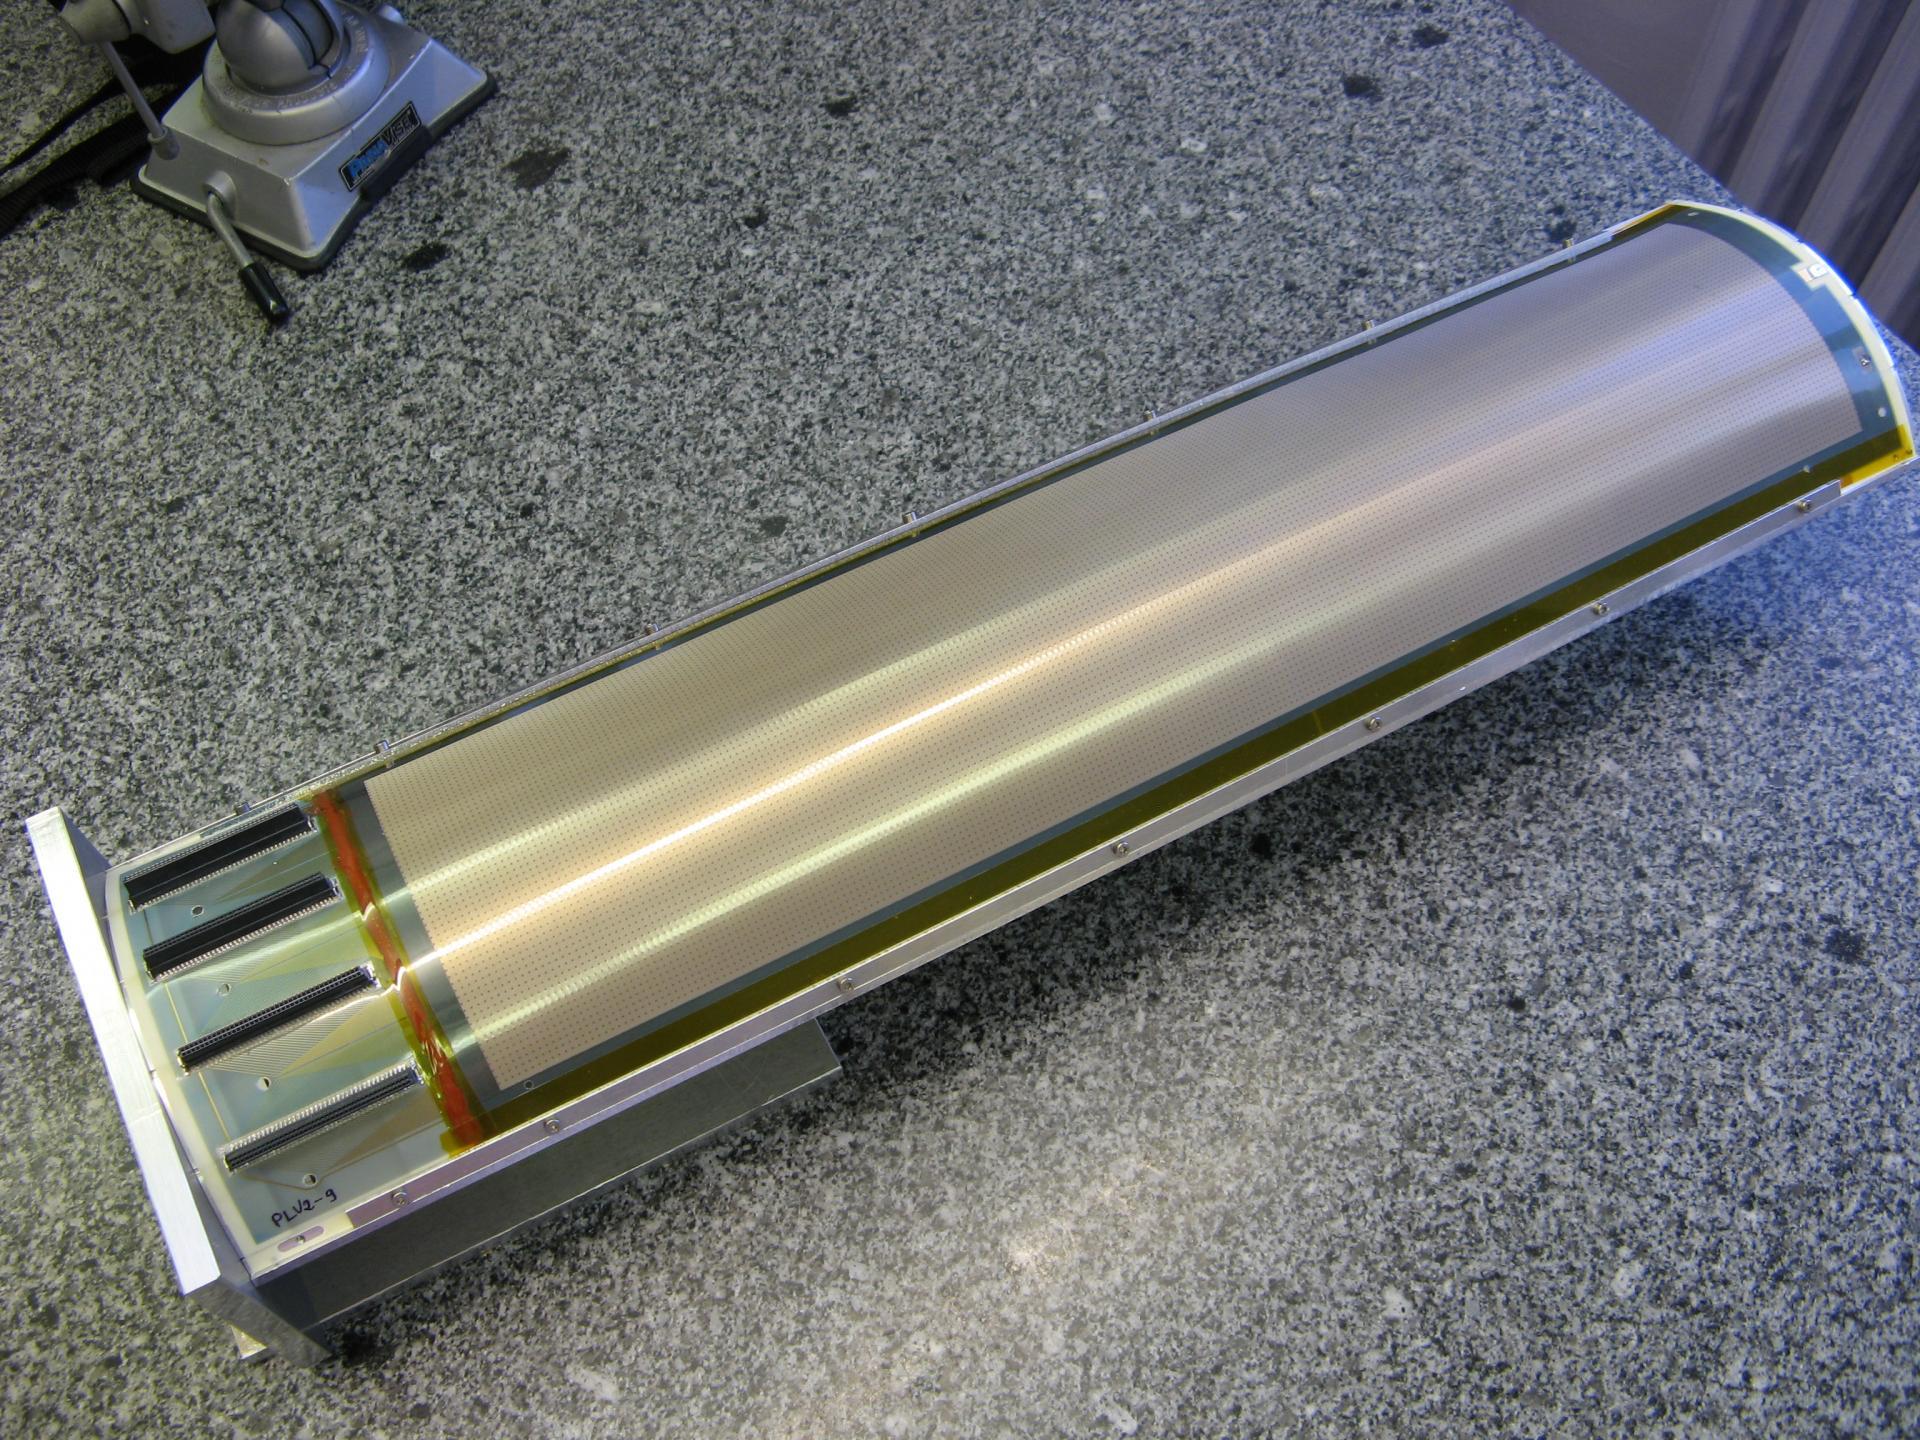 Prototype Micromegas courbe